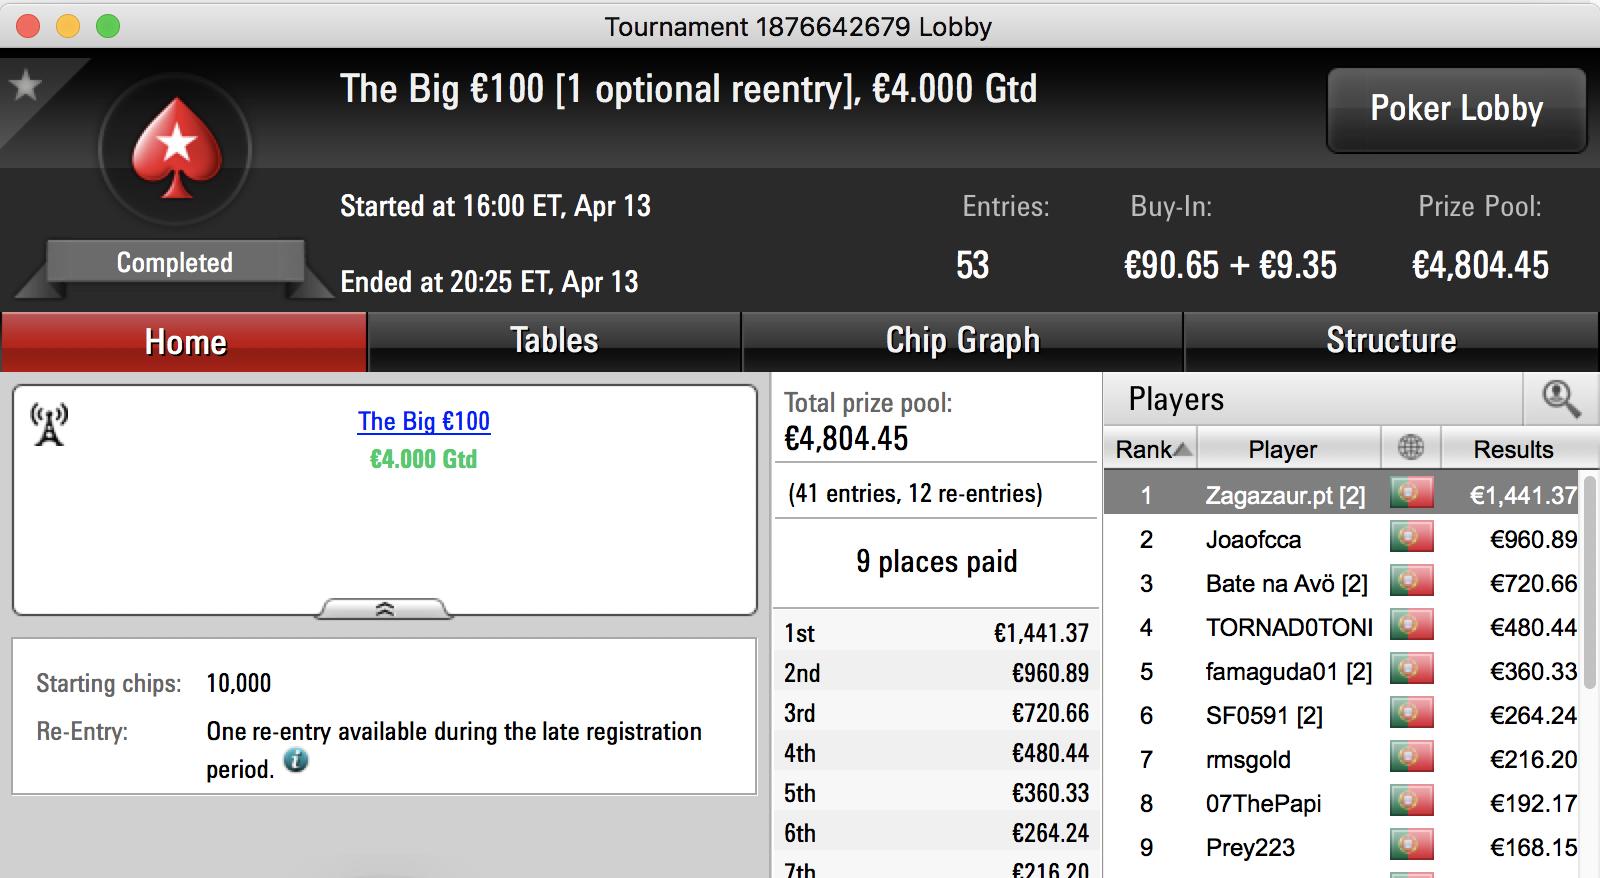 Zagazaur Vence The Big €100 & Mais 101